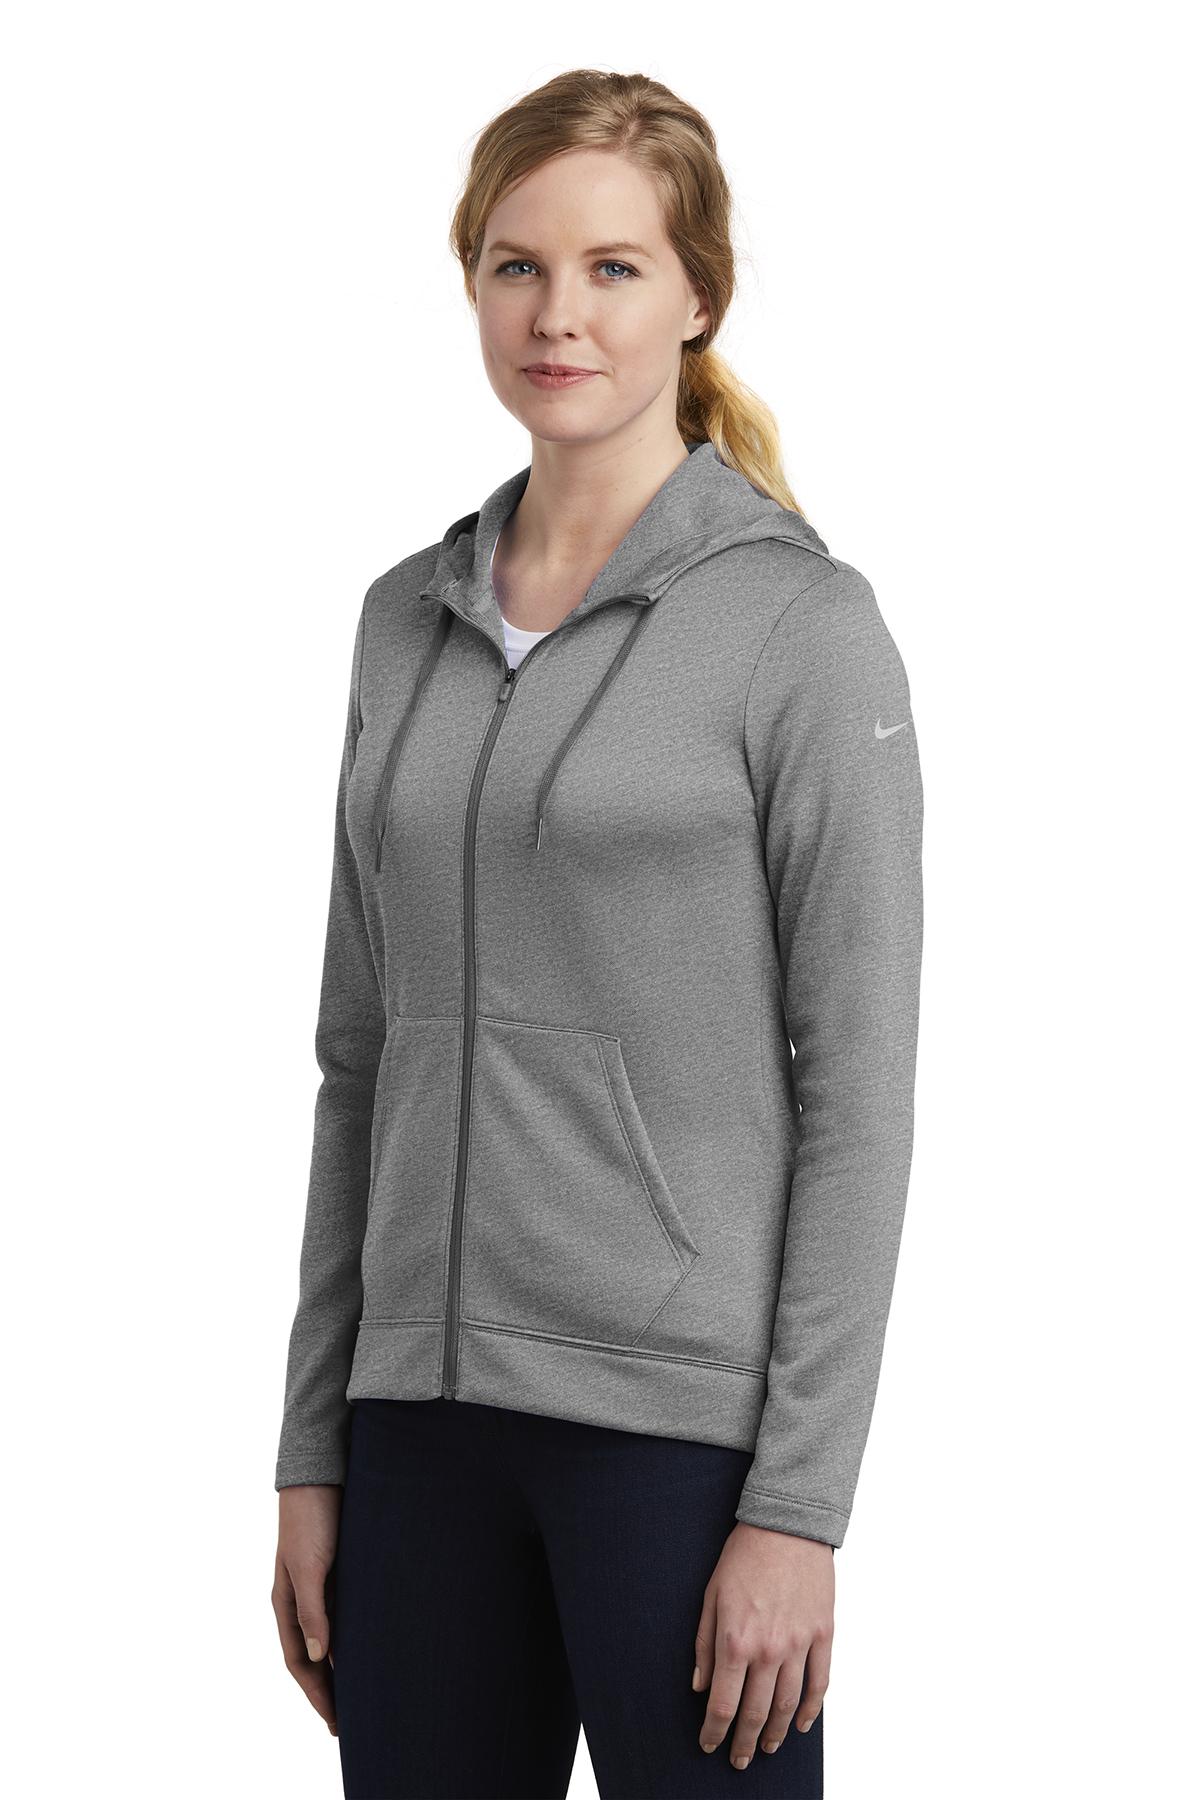 Nike Kapuzenpullover Damen. nike classic fleece damen hoody